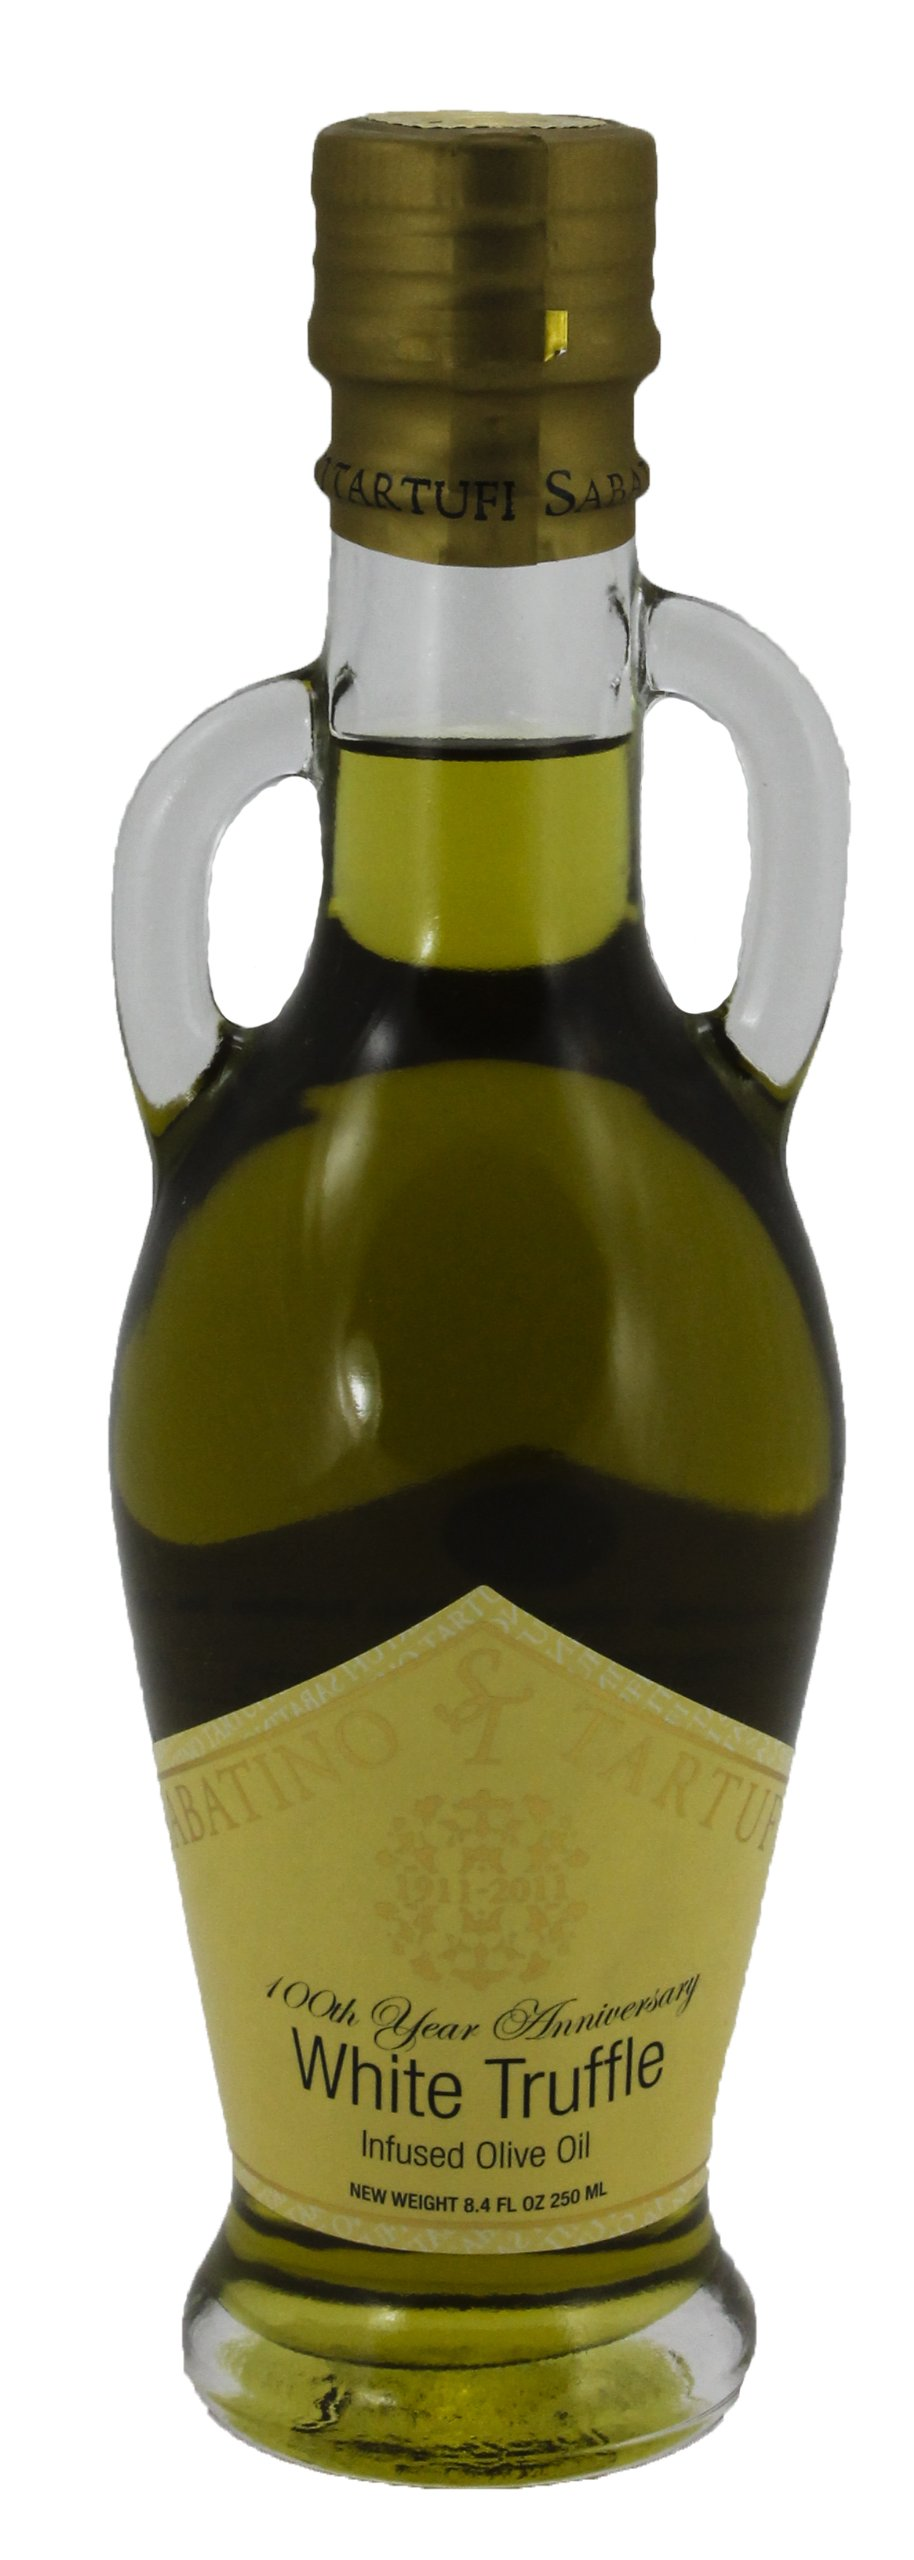 White Truffle Infused Olive Oil by Sabatino Tartufi (8.45 fluid ounce)